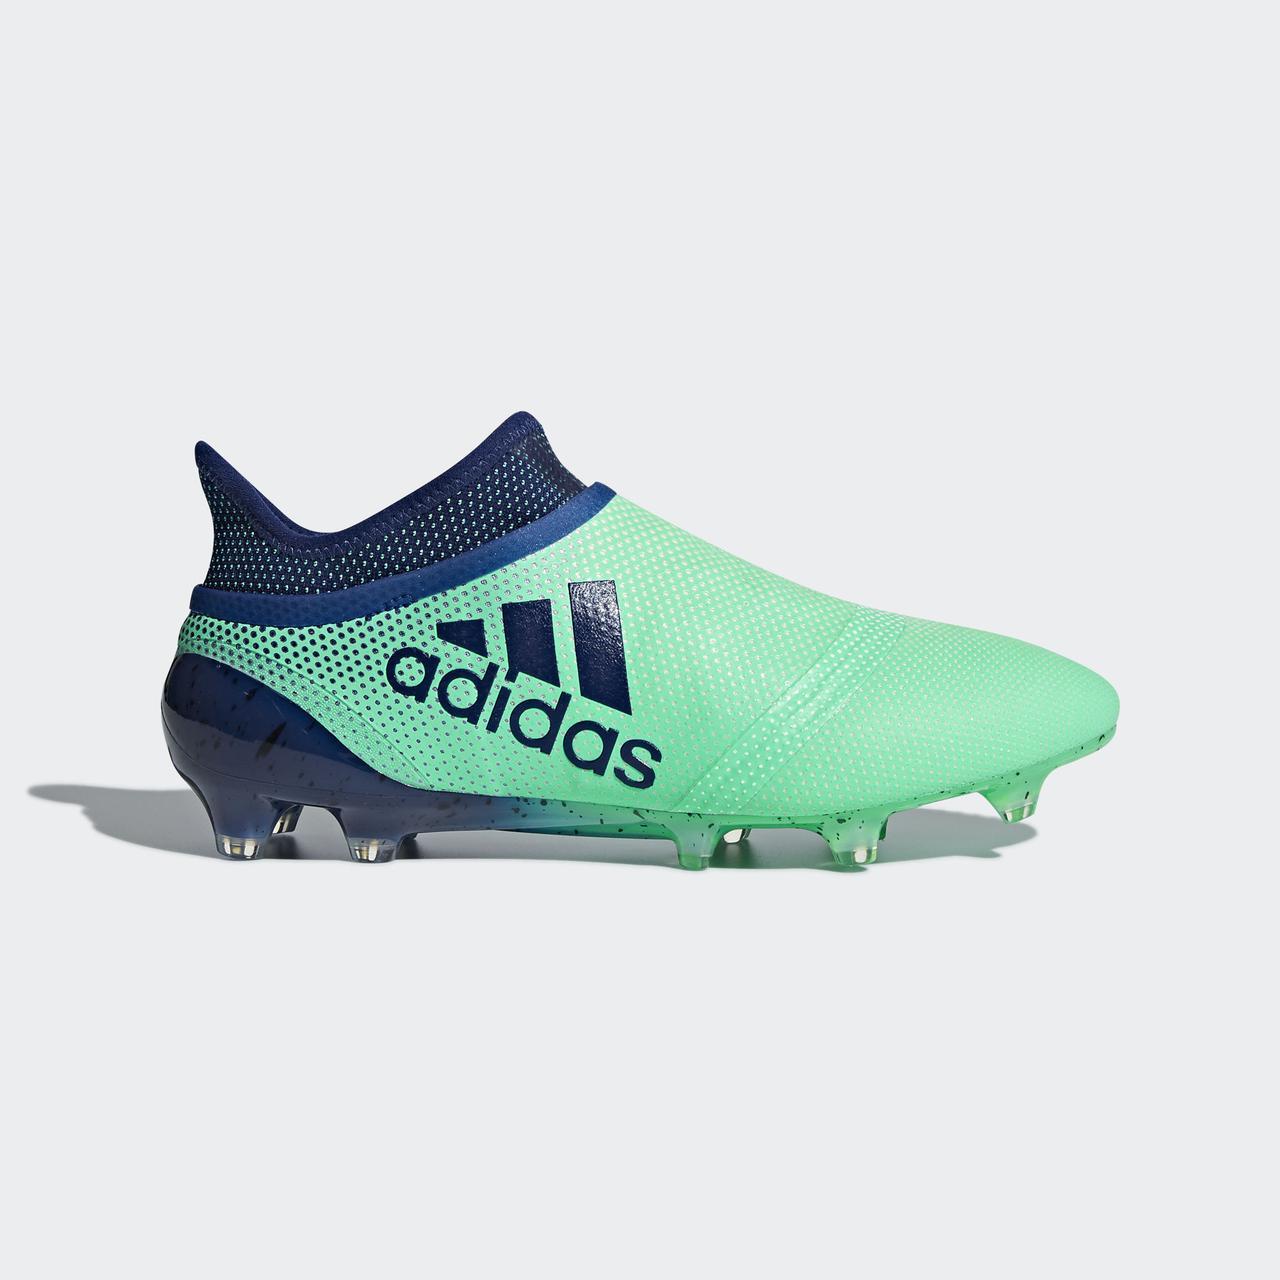 c4260c9b Футбольные бутсы Adidas Performance X 17+ Purespeed FG (Артикул: CM7713) -  Интернет